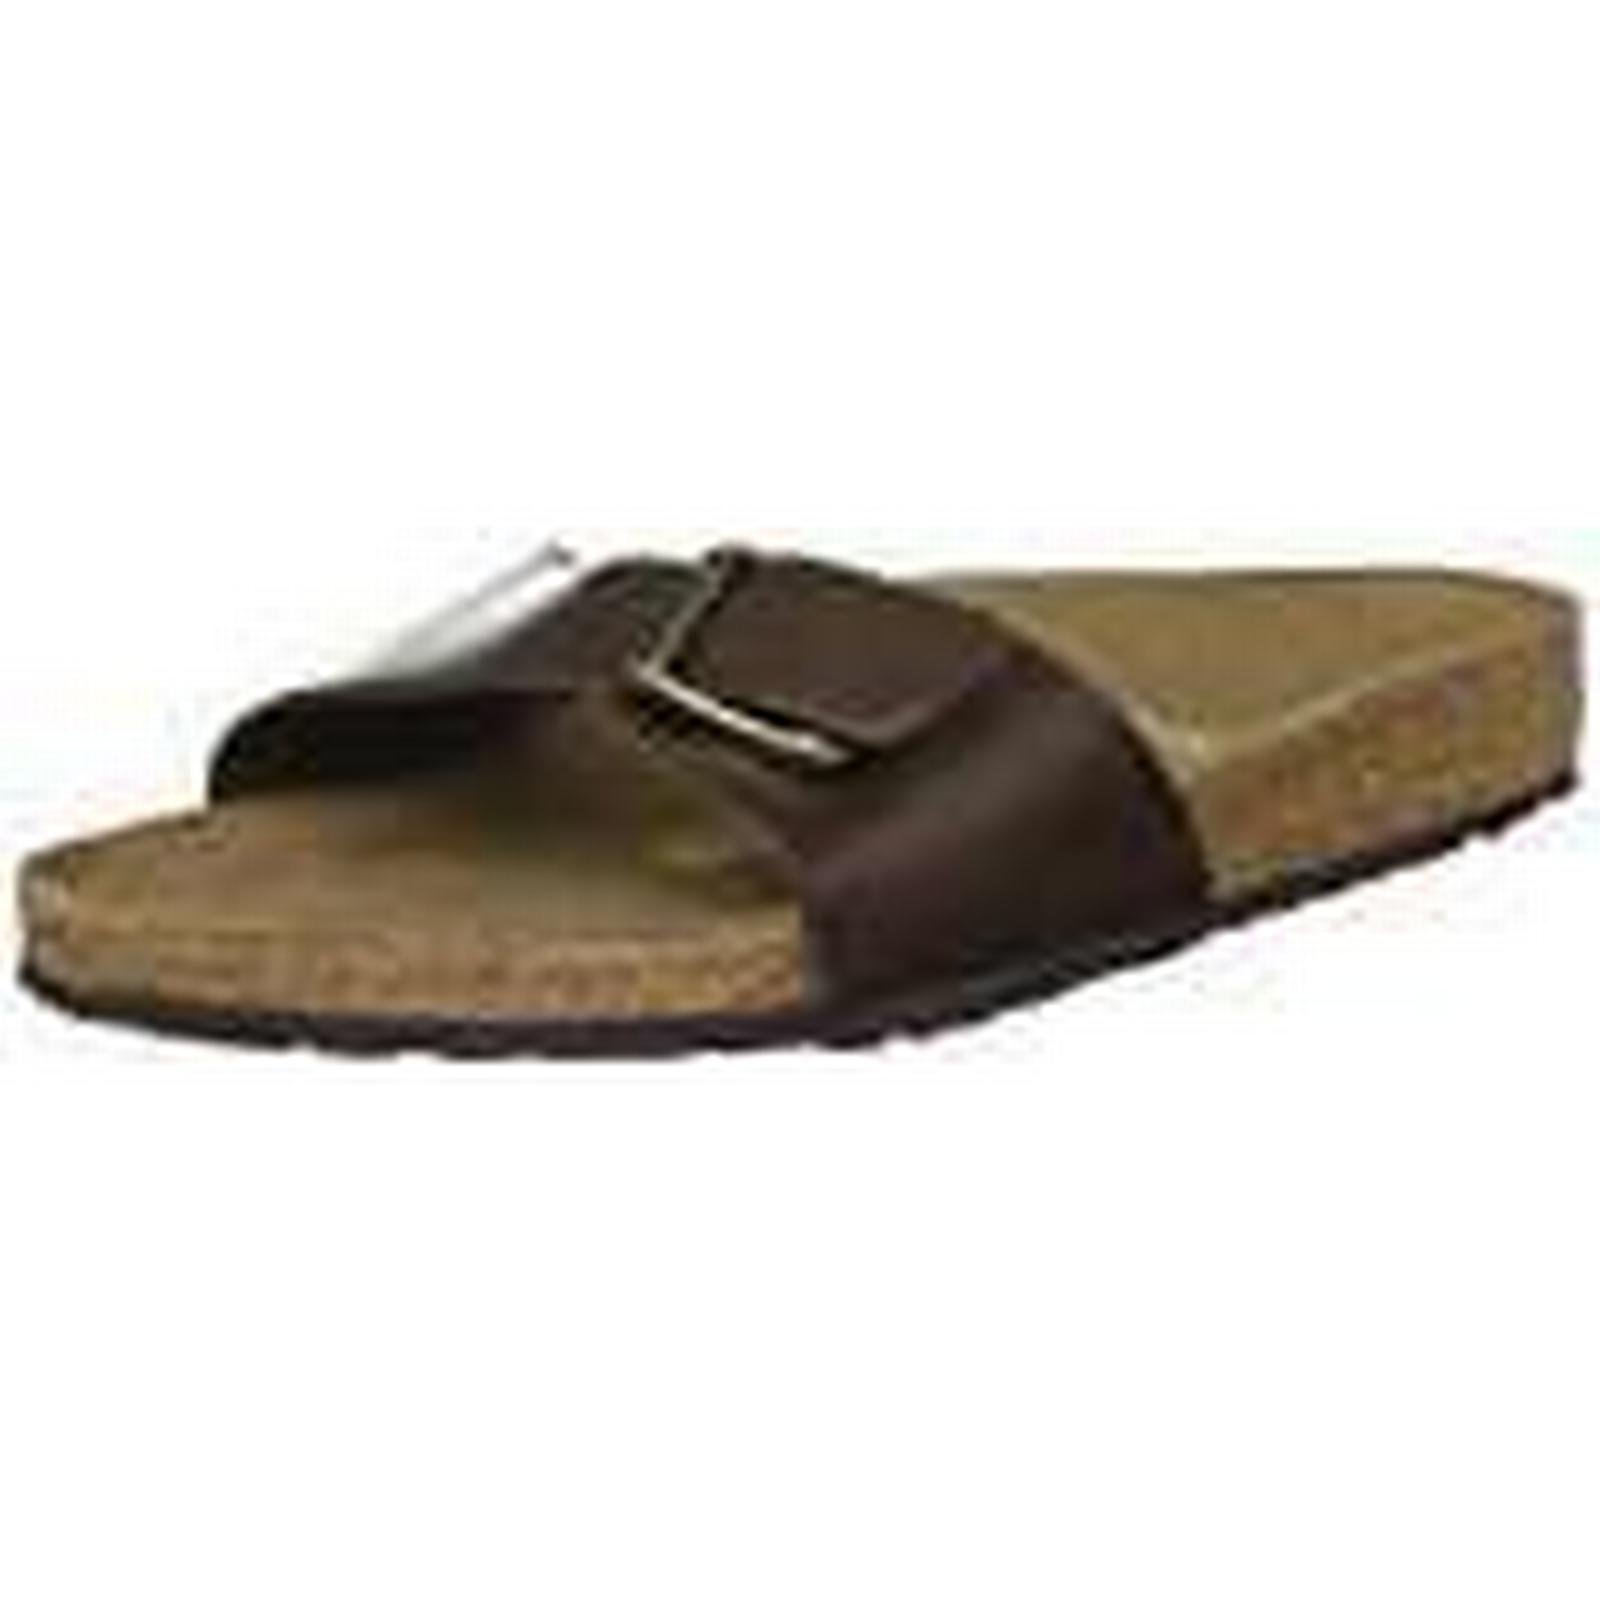 Birkenstock - Madrid Unisex-Adults' Sandals Toffee - Birkenstock 5.5 UK 40cc25